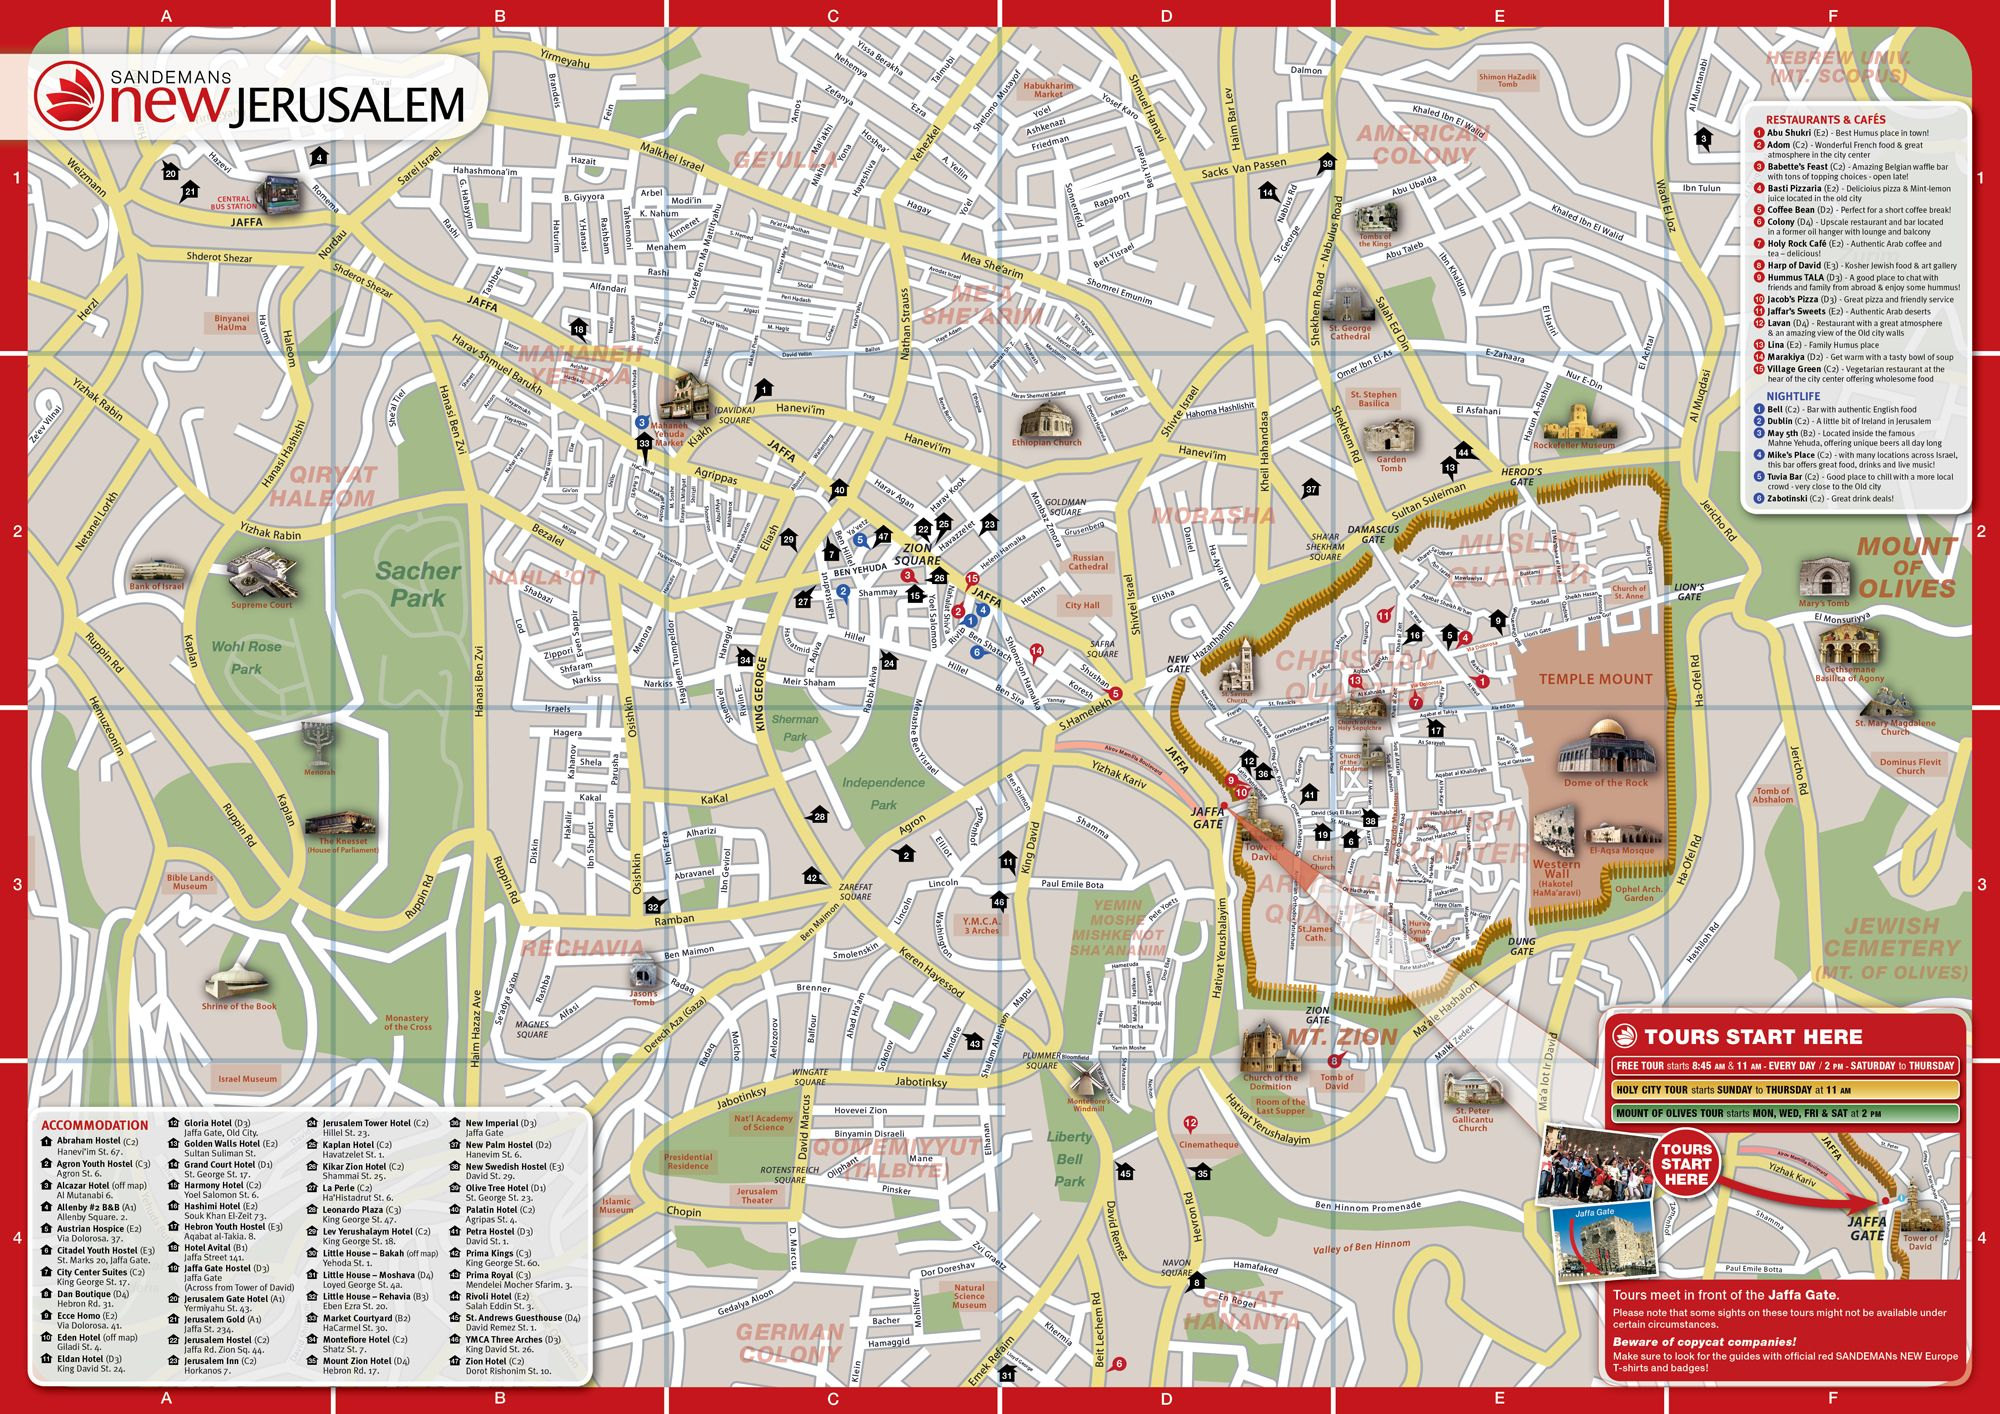 christian tour guides in jerusalem